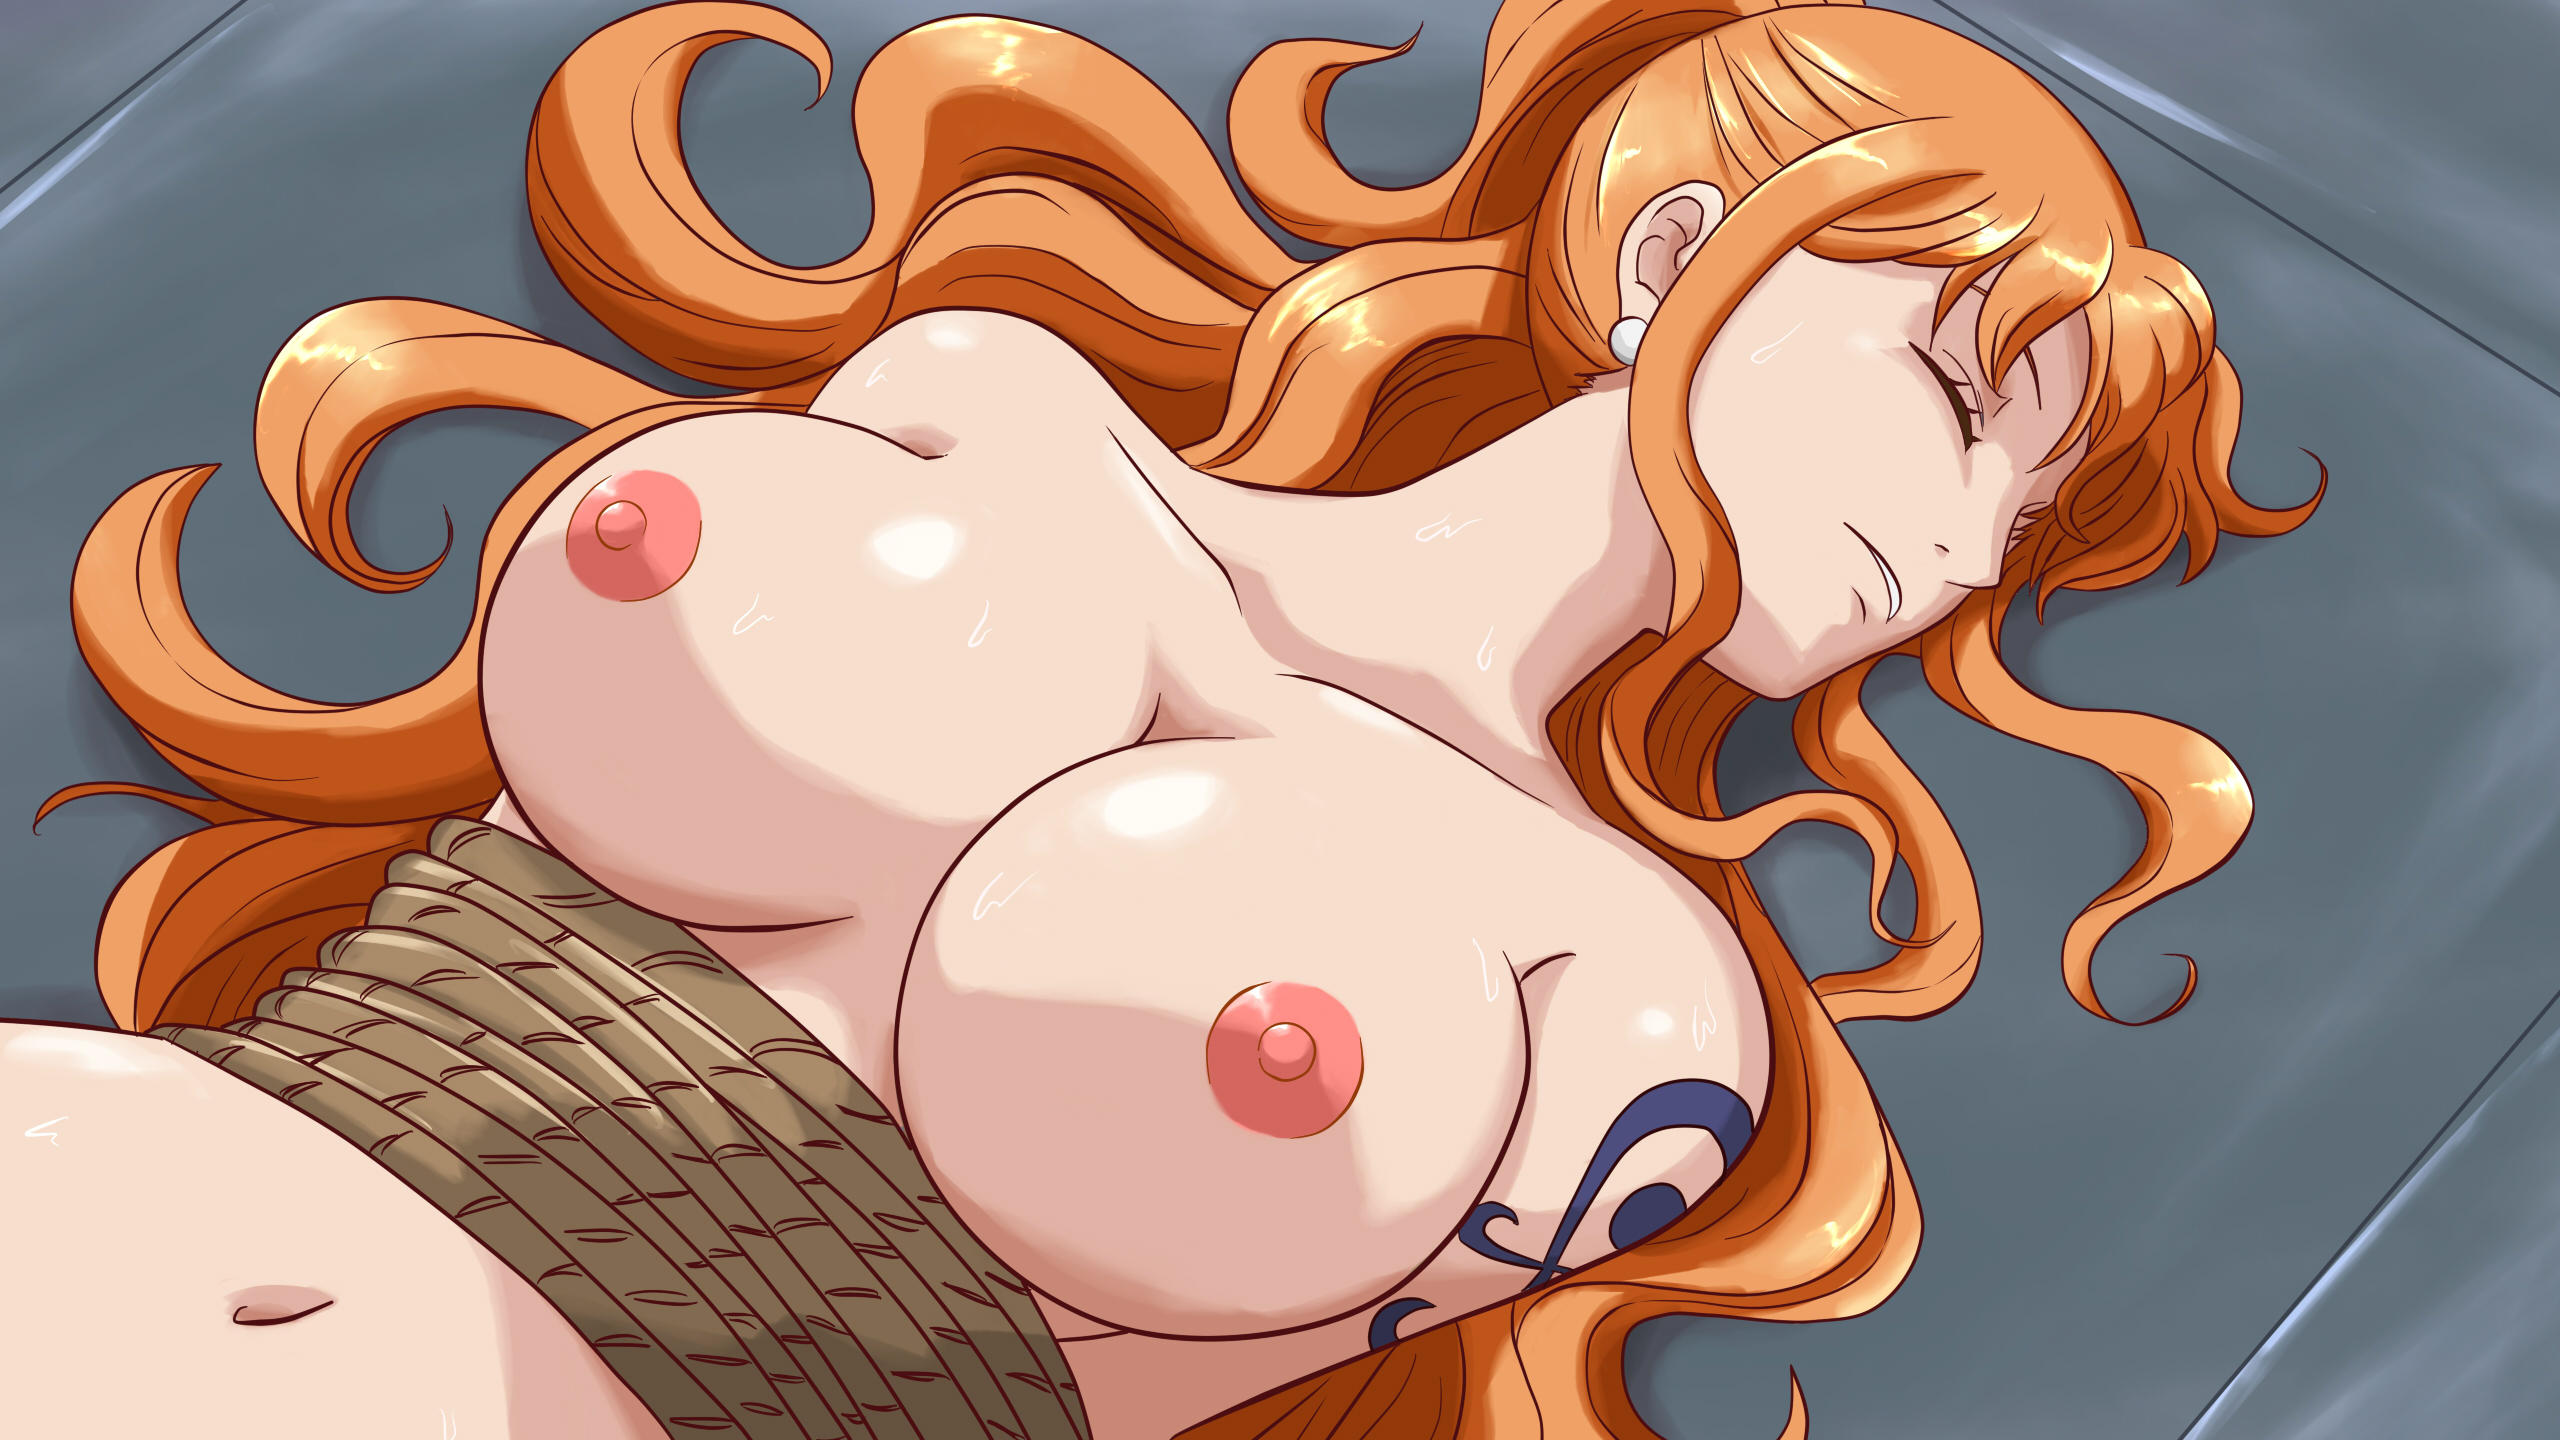 One Piece Hentai Chopper image #231516